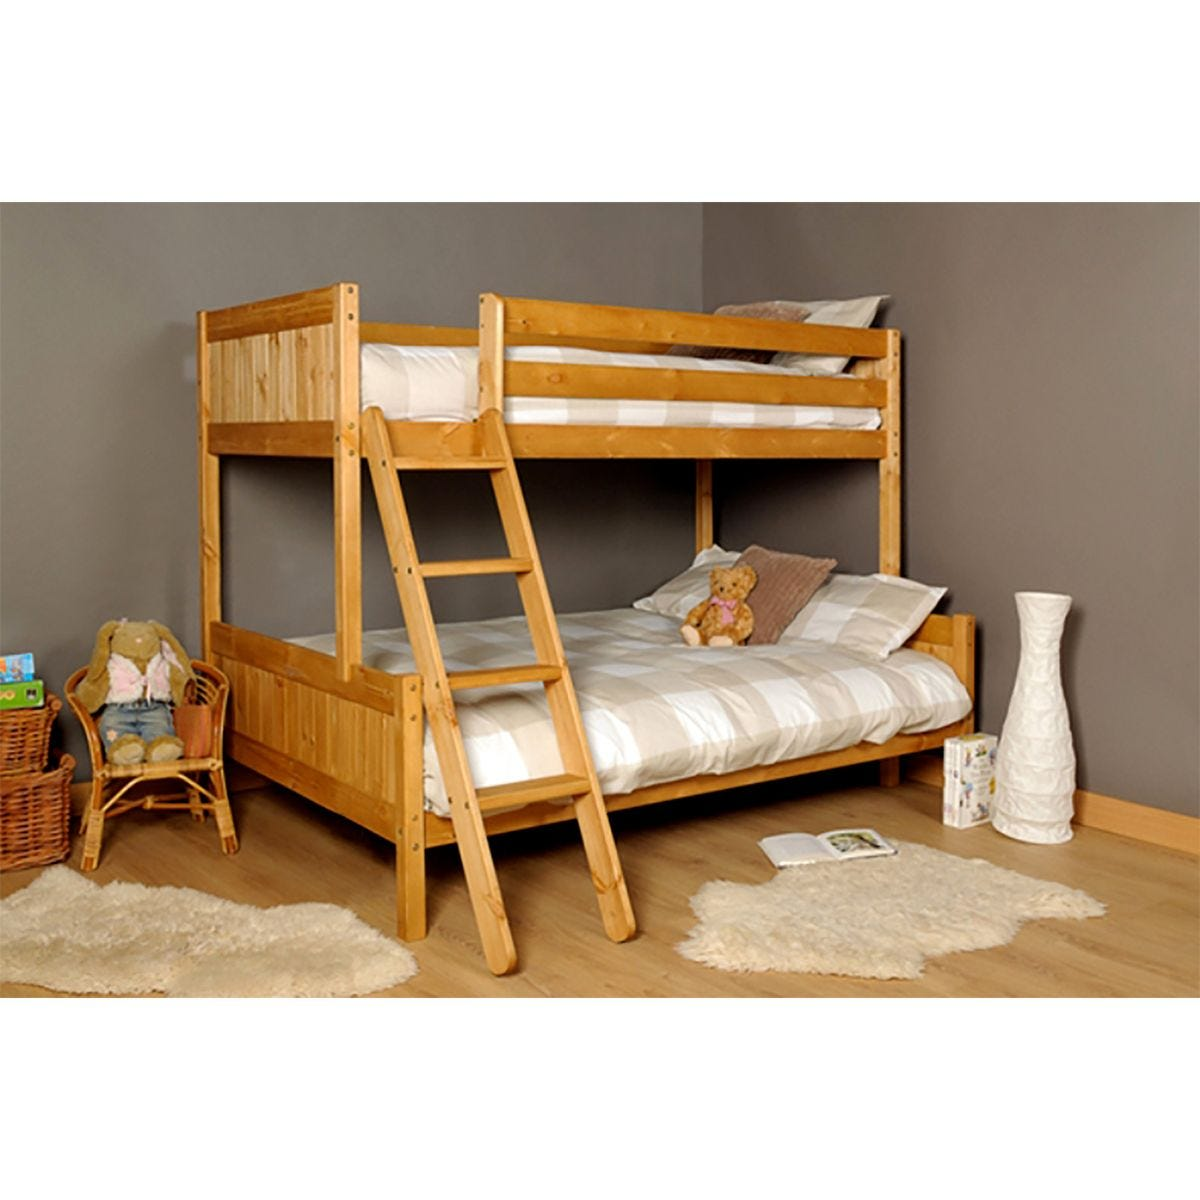 Islington Single Triple Bunk Bed - Caramel